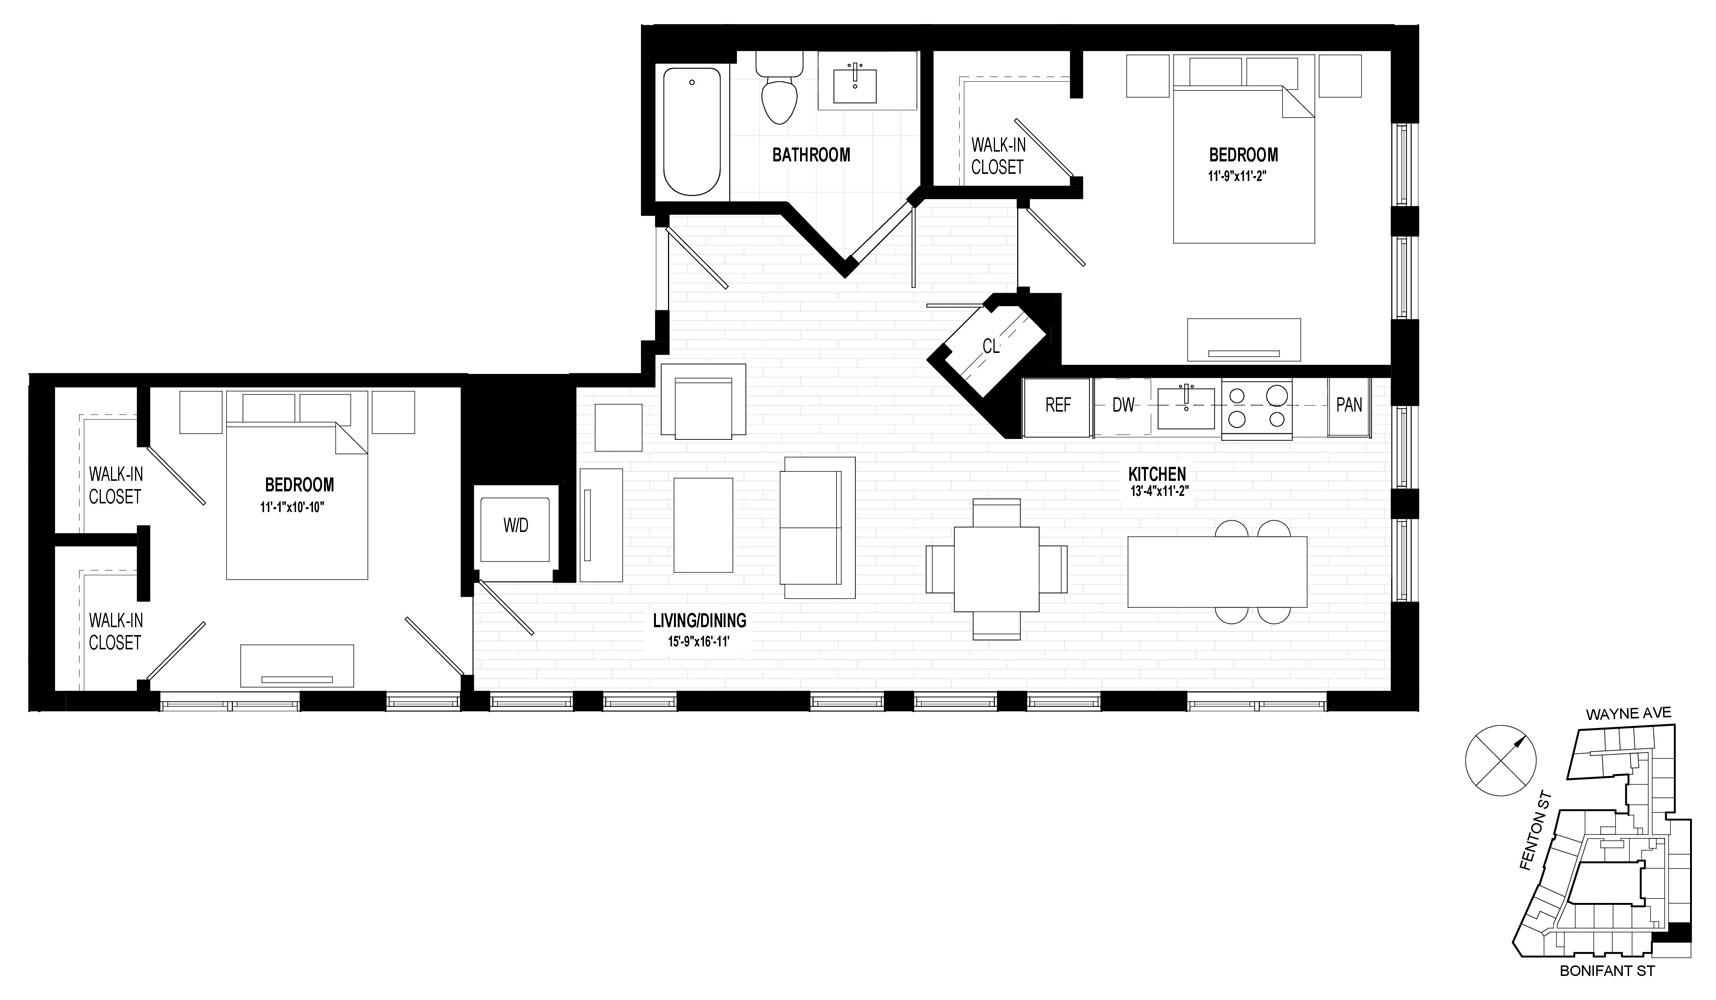 P0578887 761bc02 central c10 890 2 floorplan